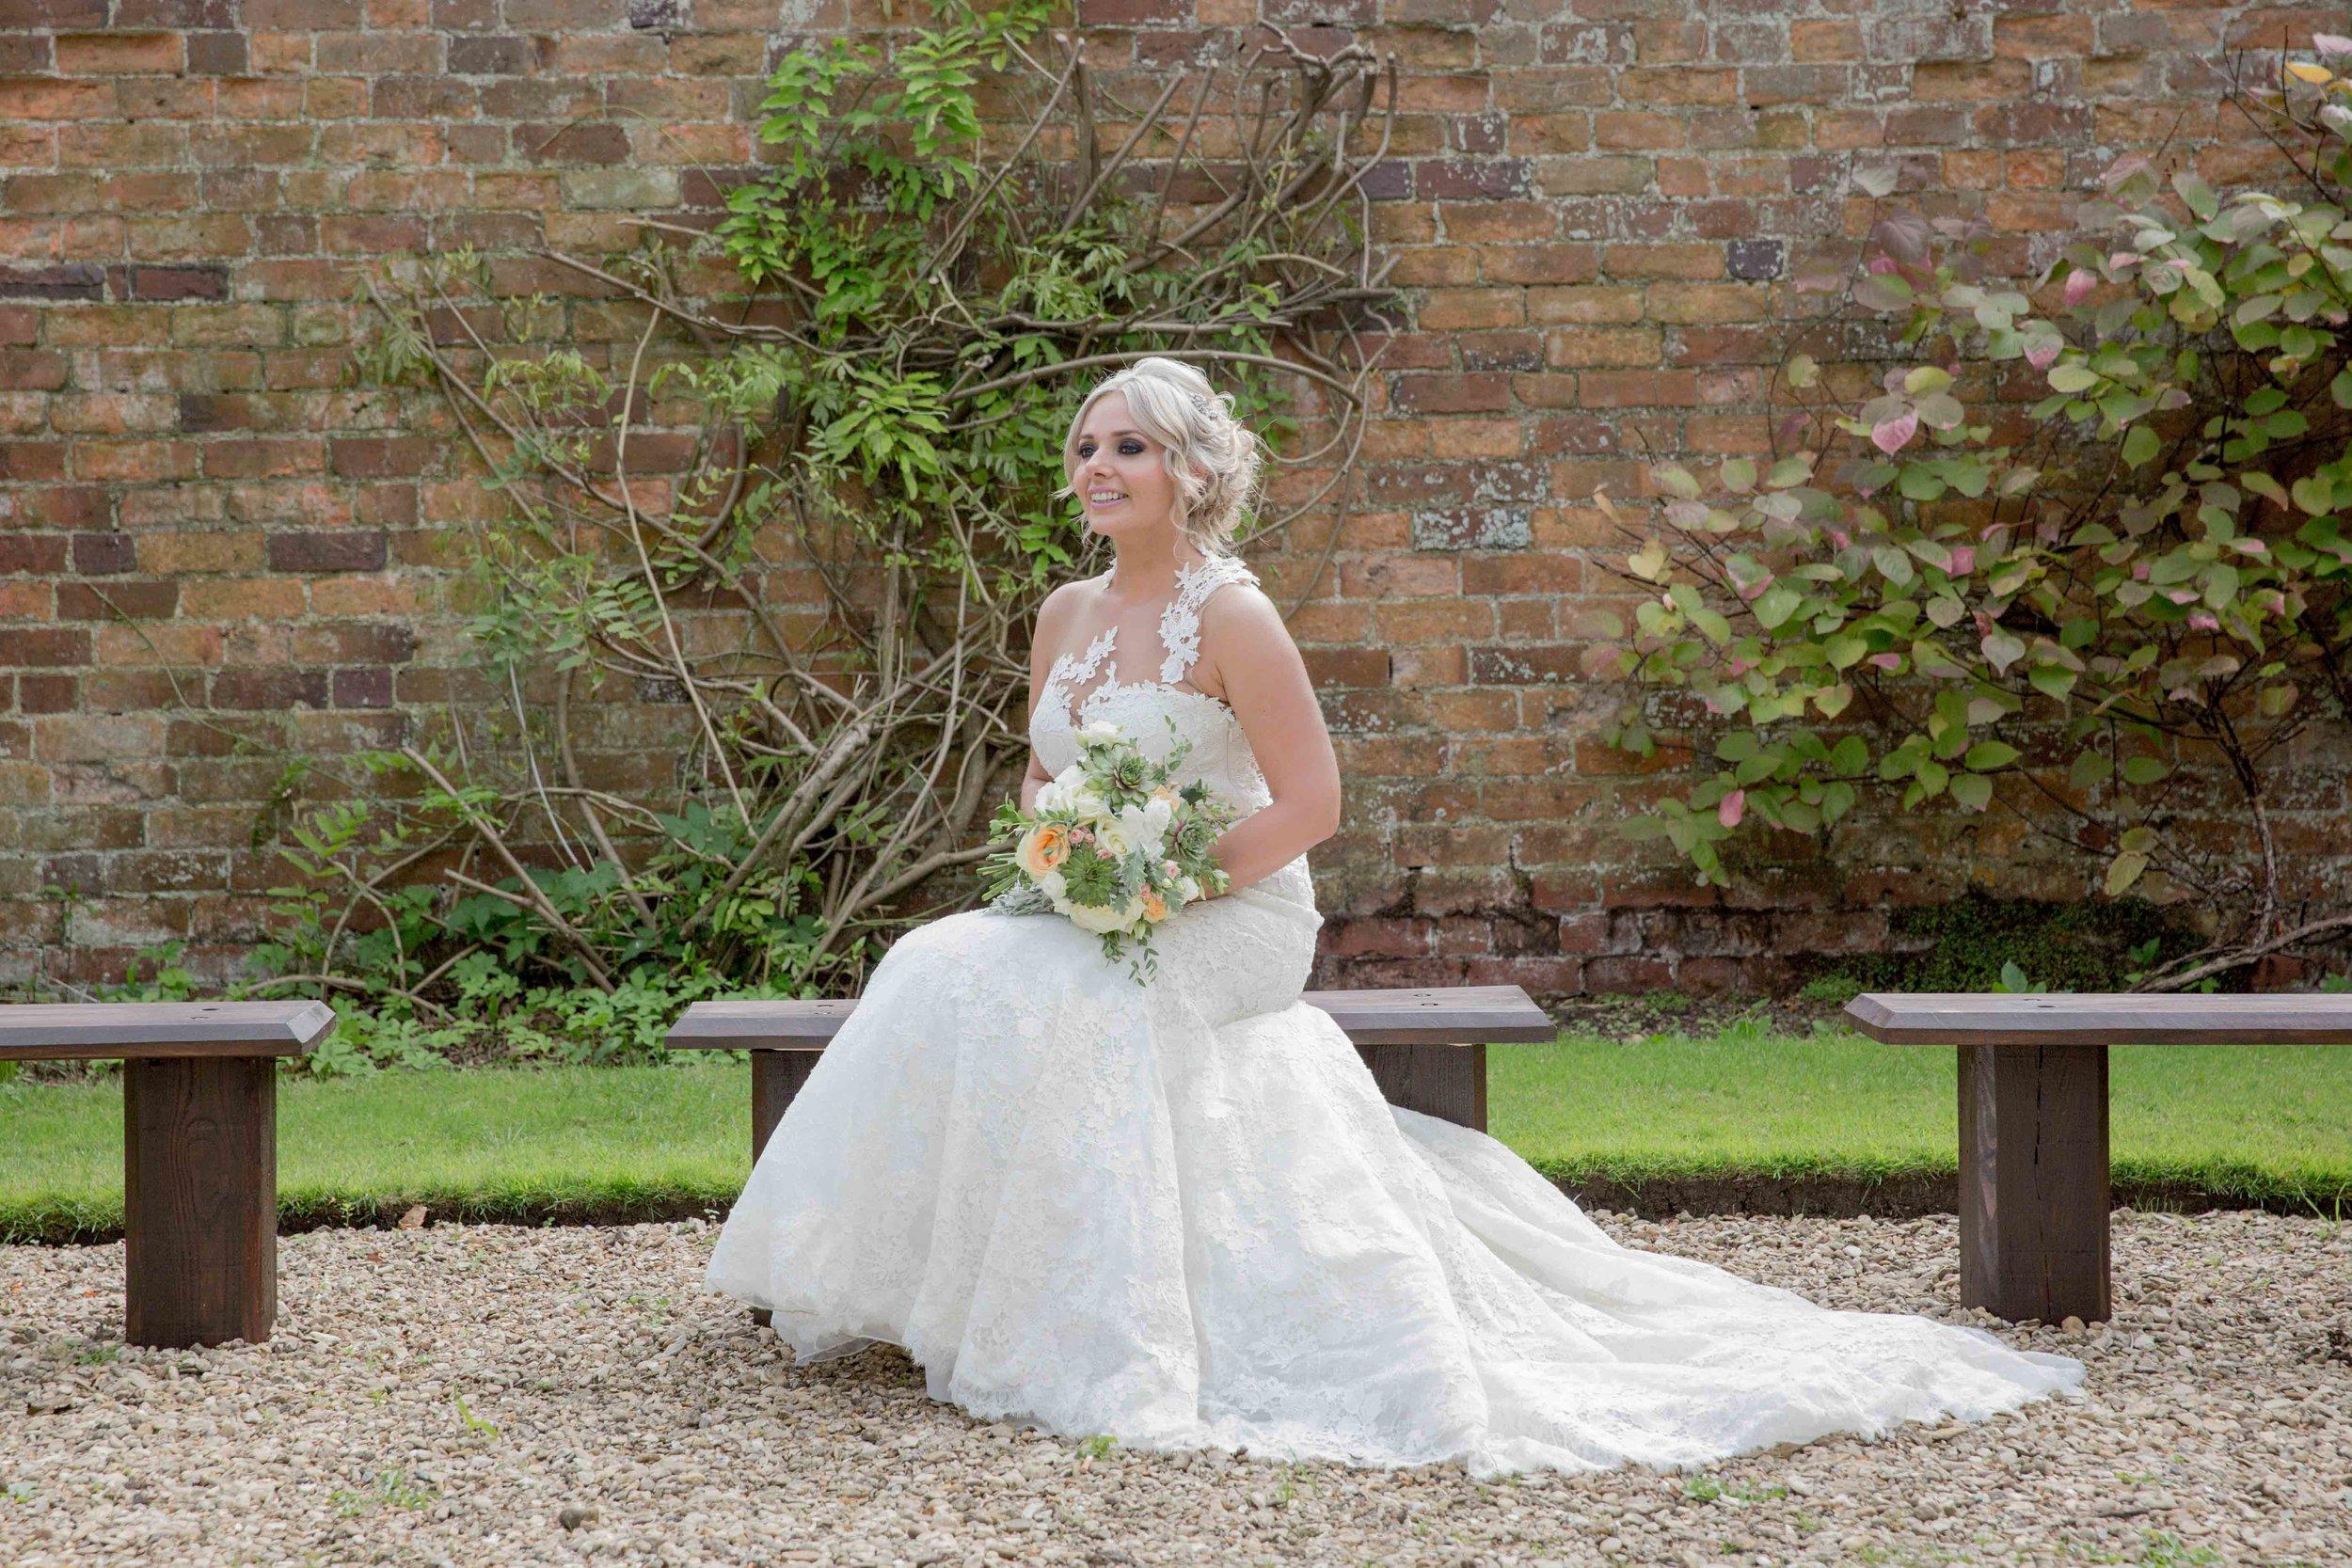 cotswold-wedding-photography-at-stonehouse-court-hotel-natalia-smith-photography-gloucestershire-wedding-photographer-64.jpg